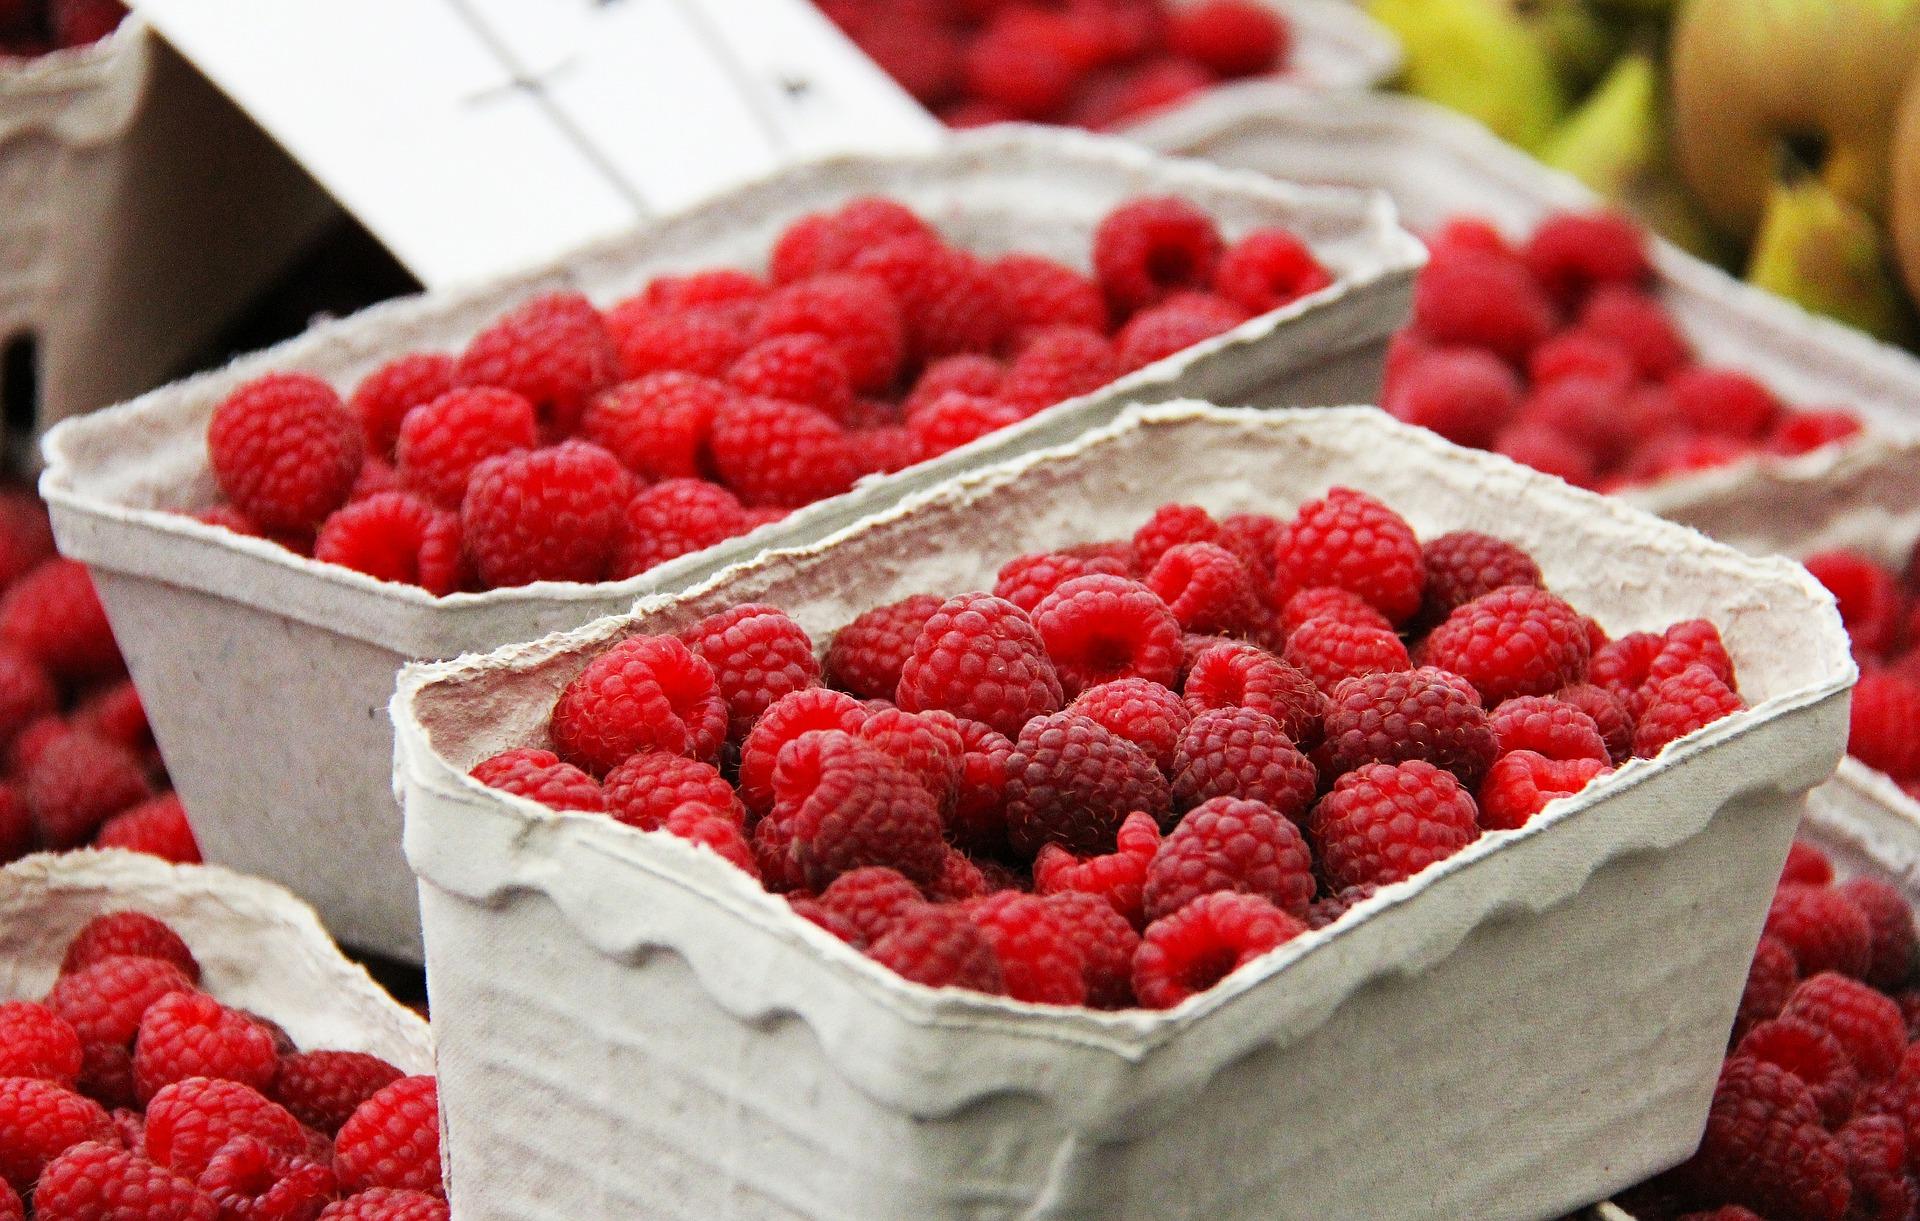 fruits-606555_1920.jpg